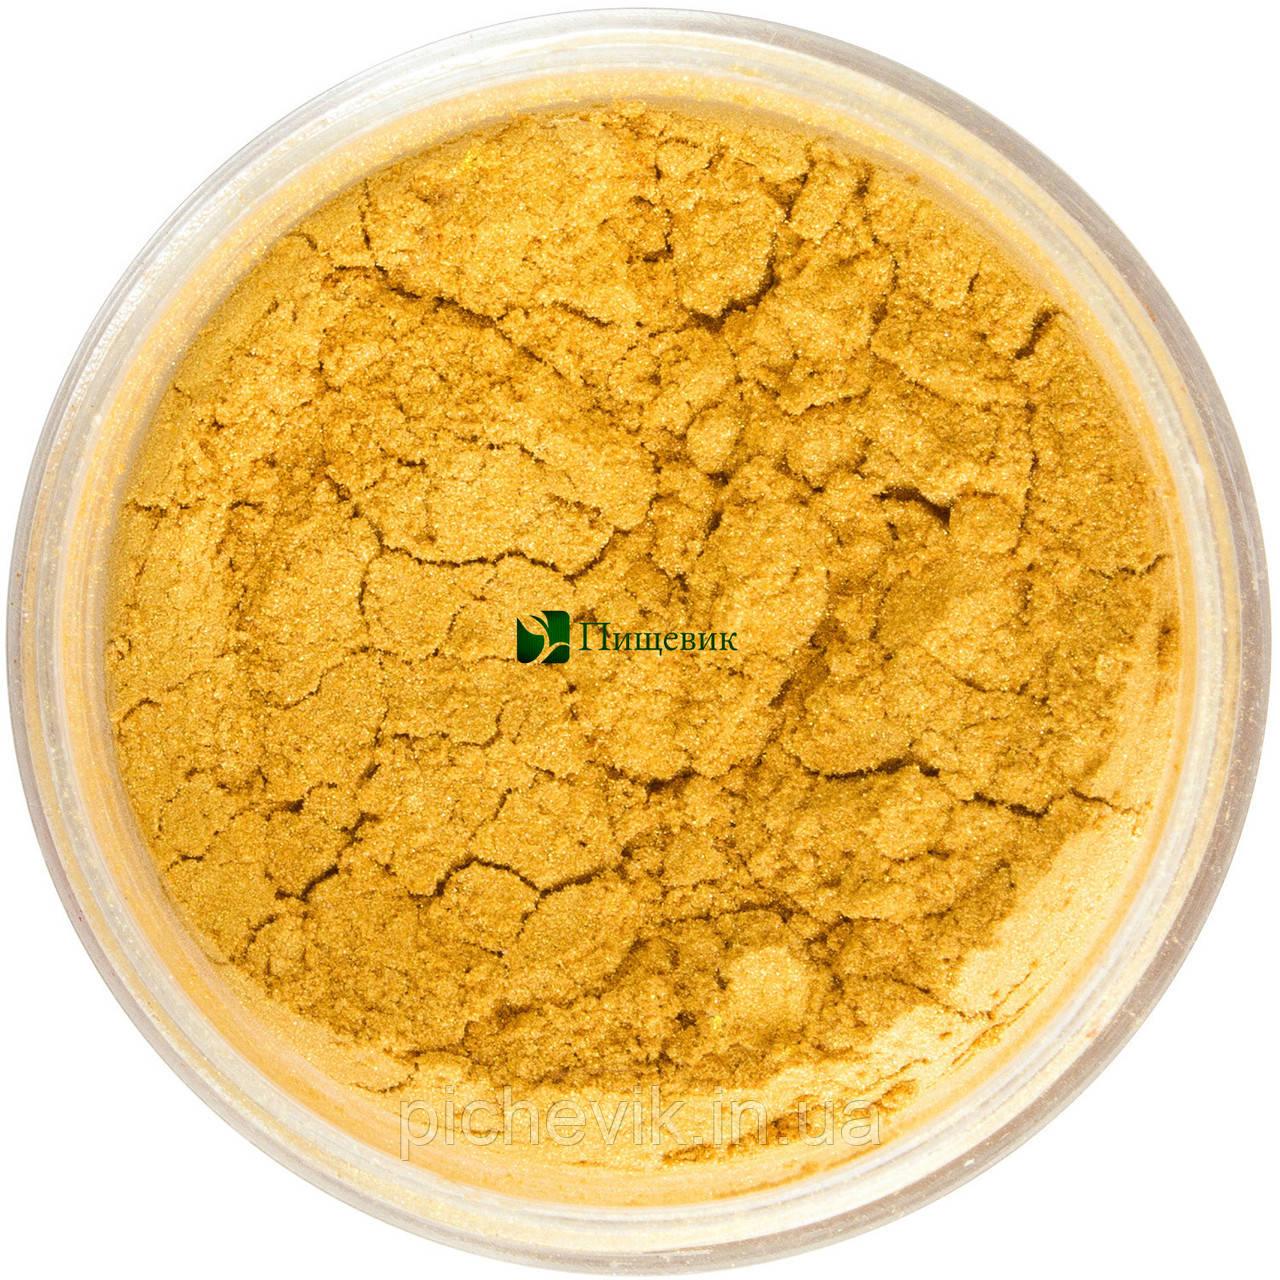 Краситель Тартразин (желтый) Е-102 (Индия) вес:1 кг